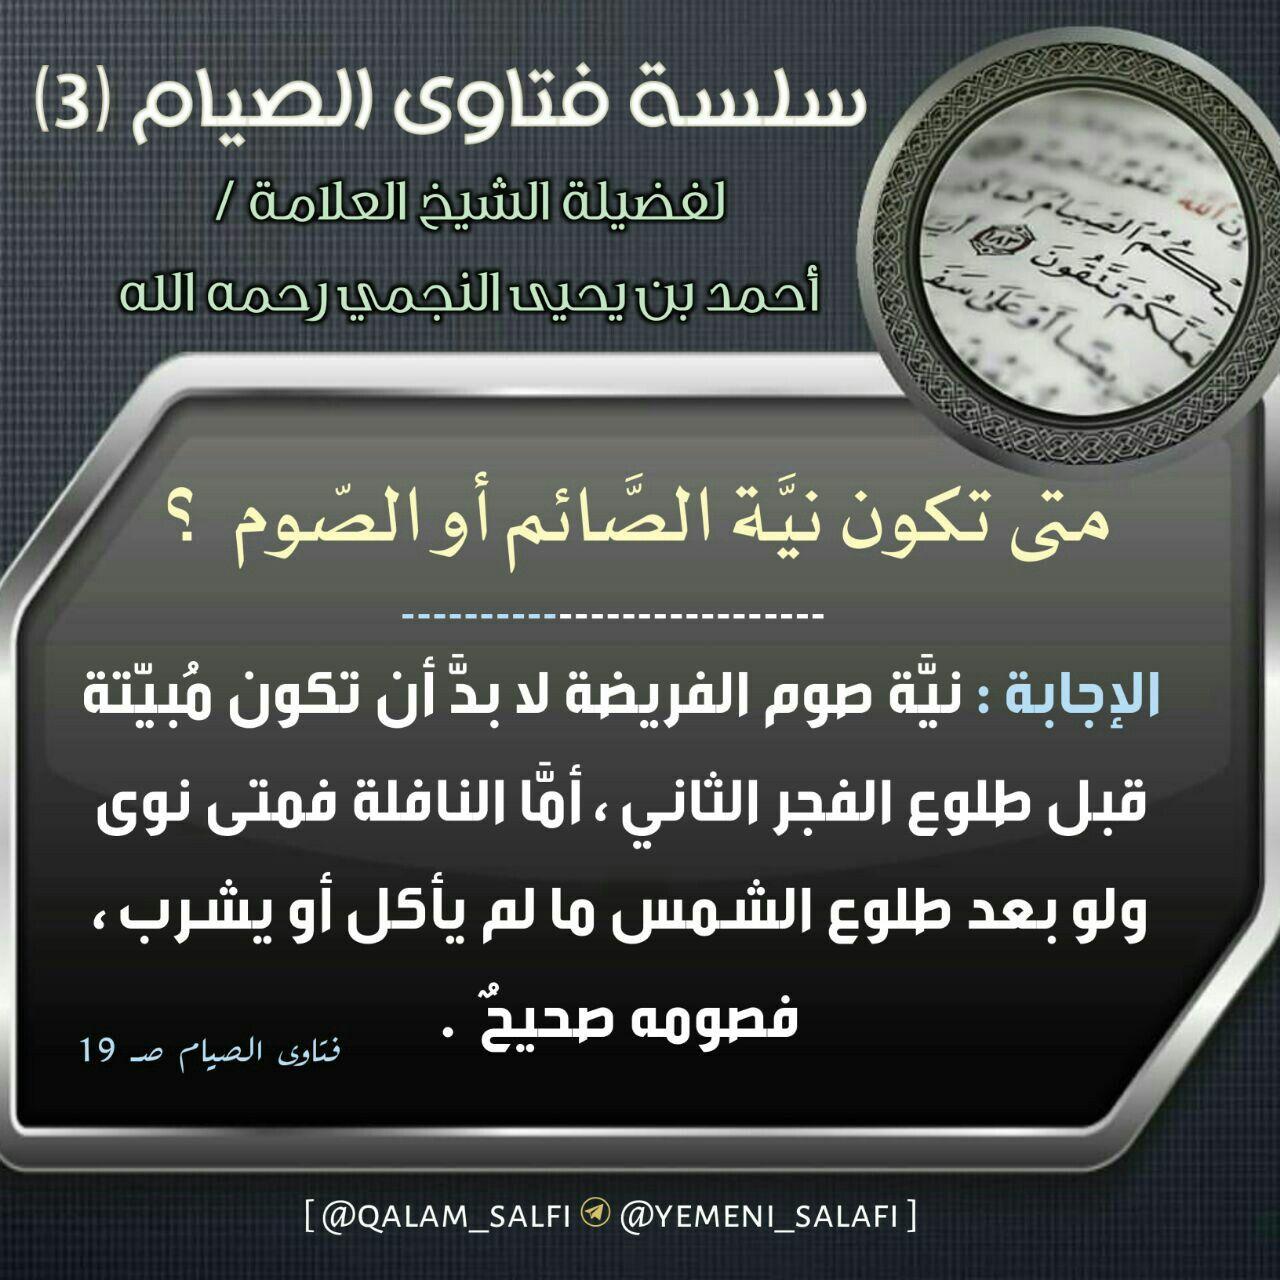 Pin By زهرة الياسمين On رمضان Sheet Pan Personalized Items Person